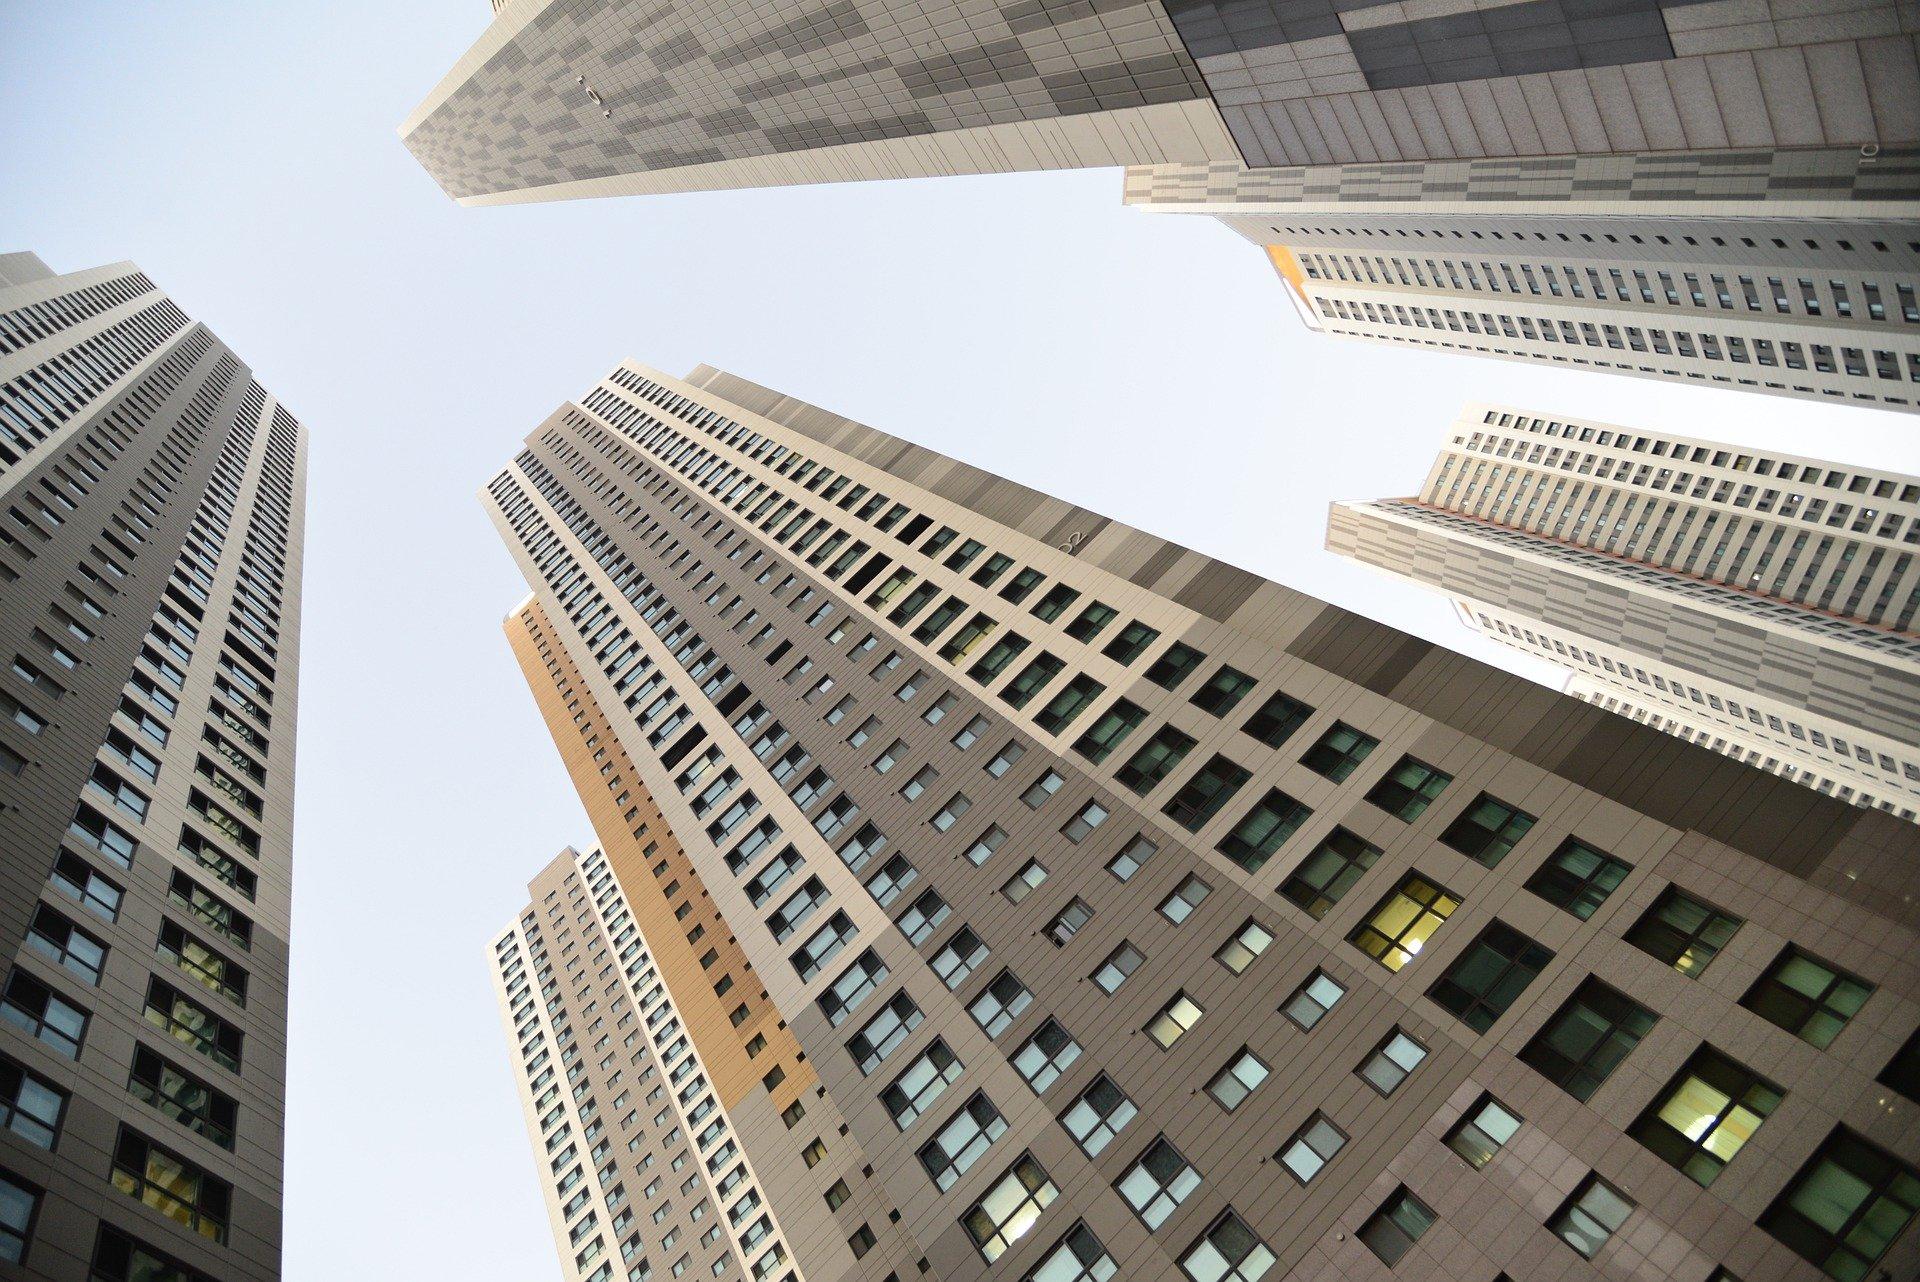 Residencial atrai investidores